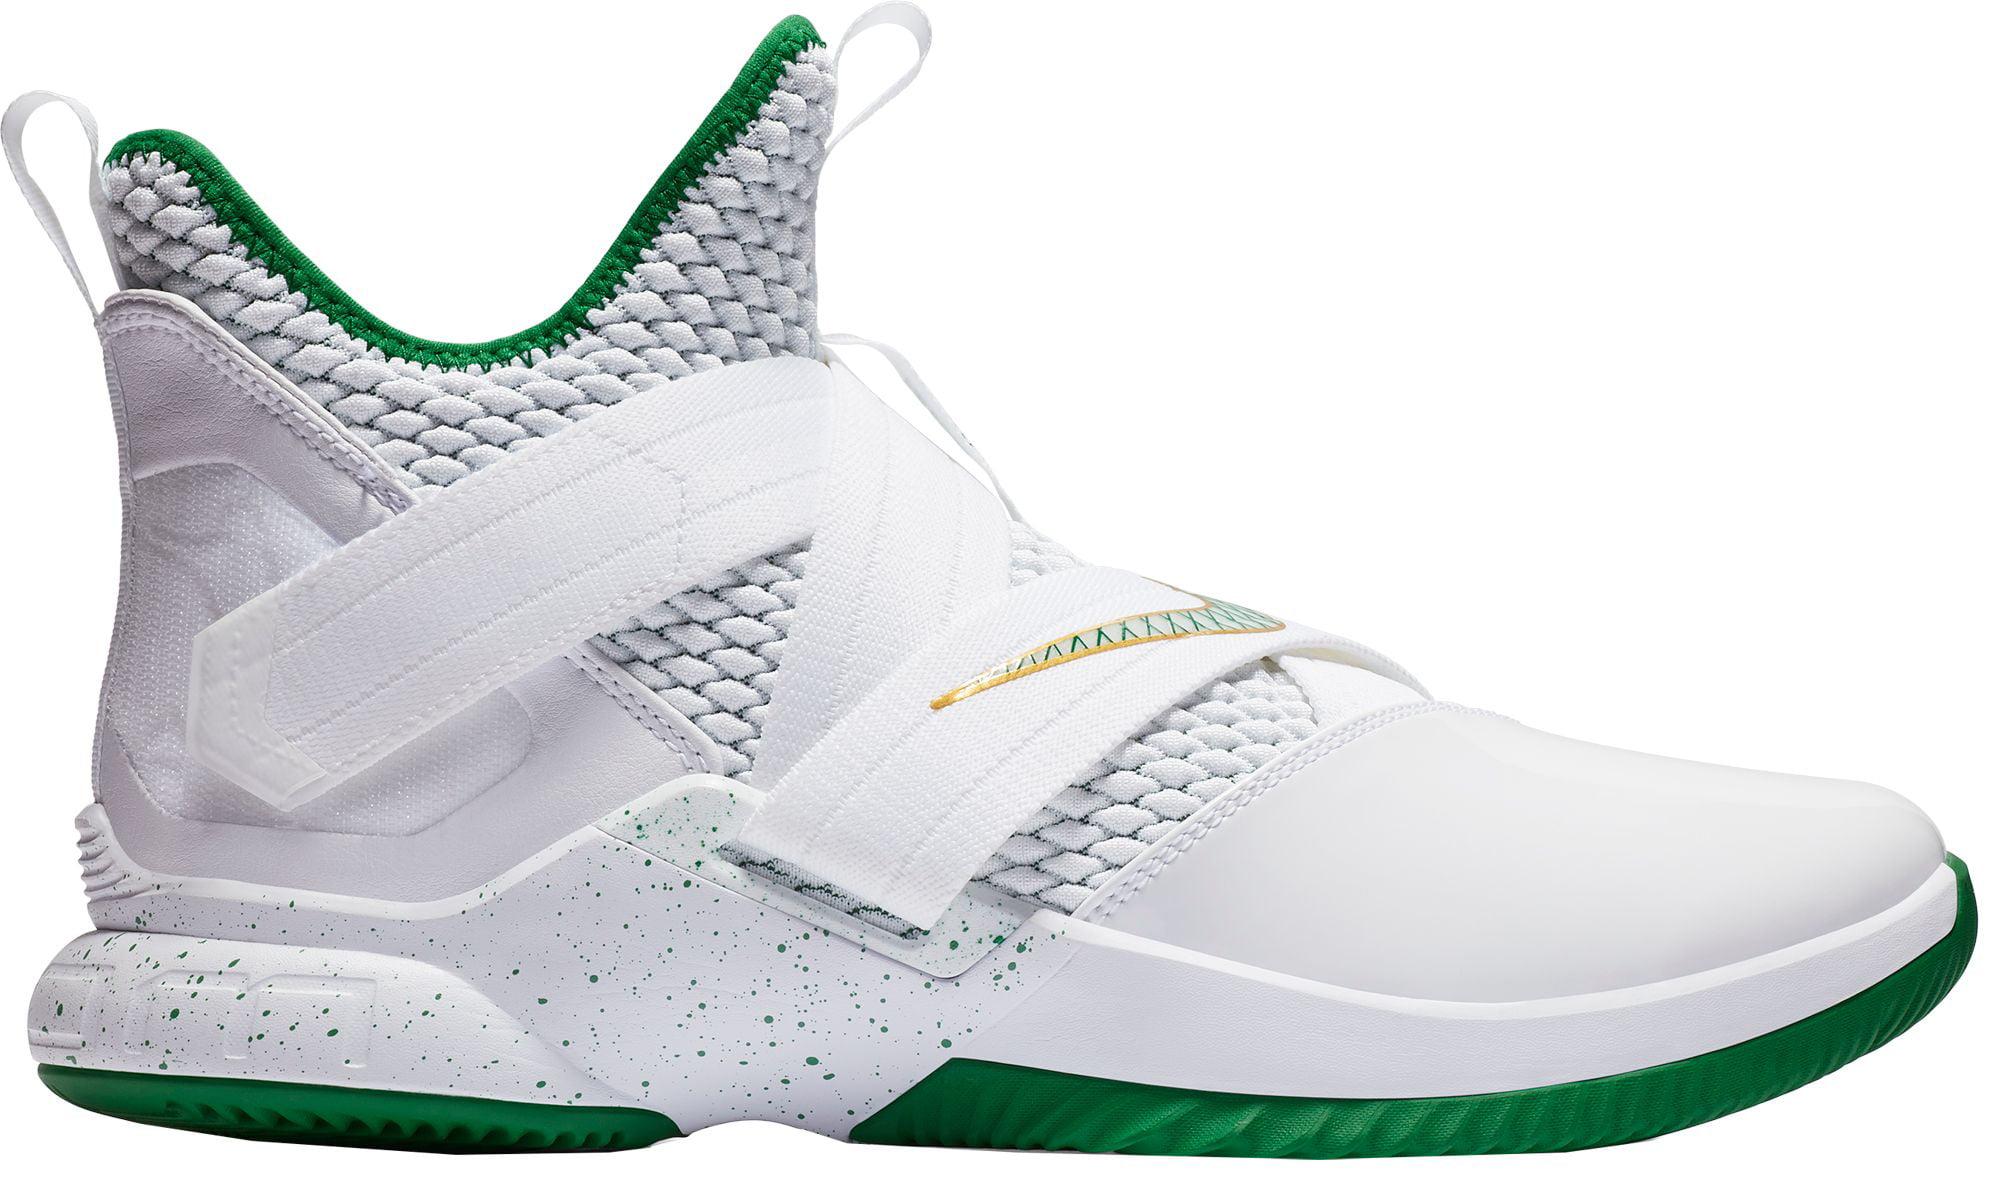 Nike Men's Zoom LeBron Soldier XII